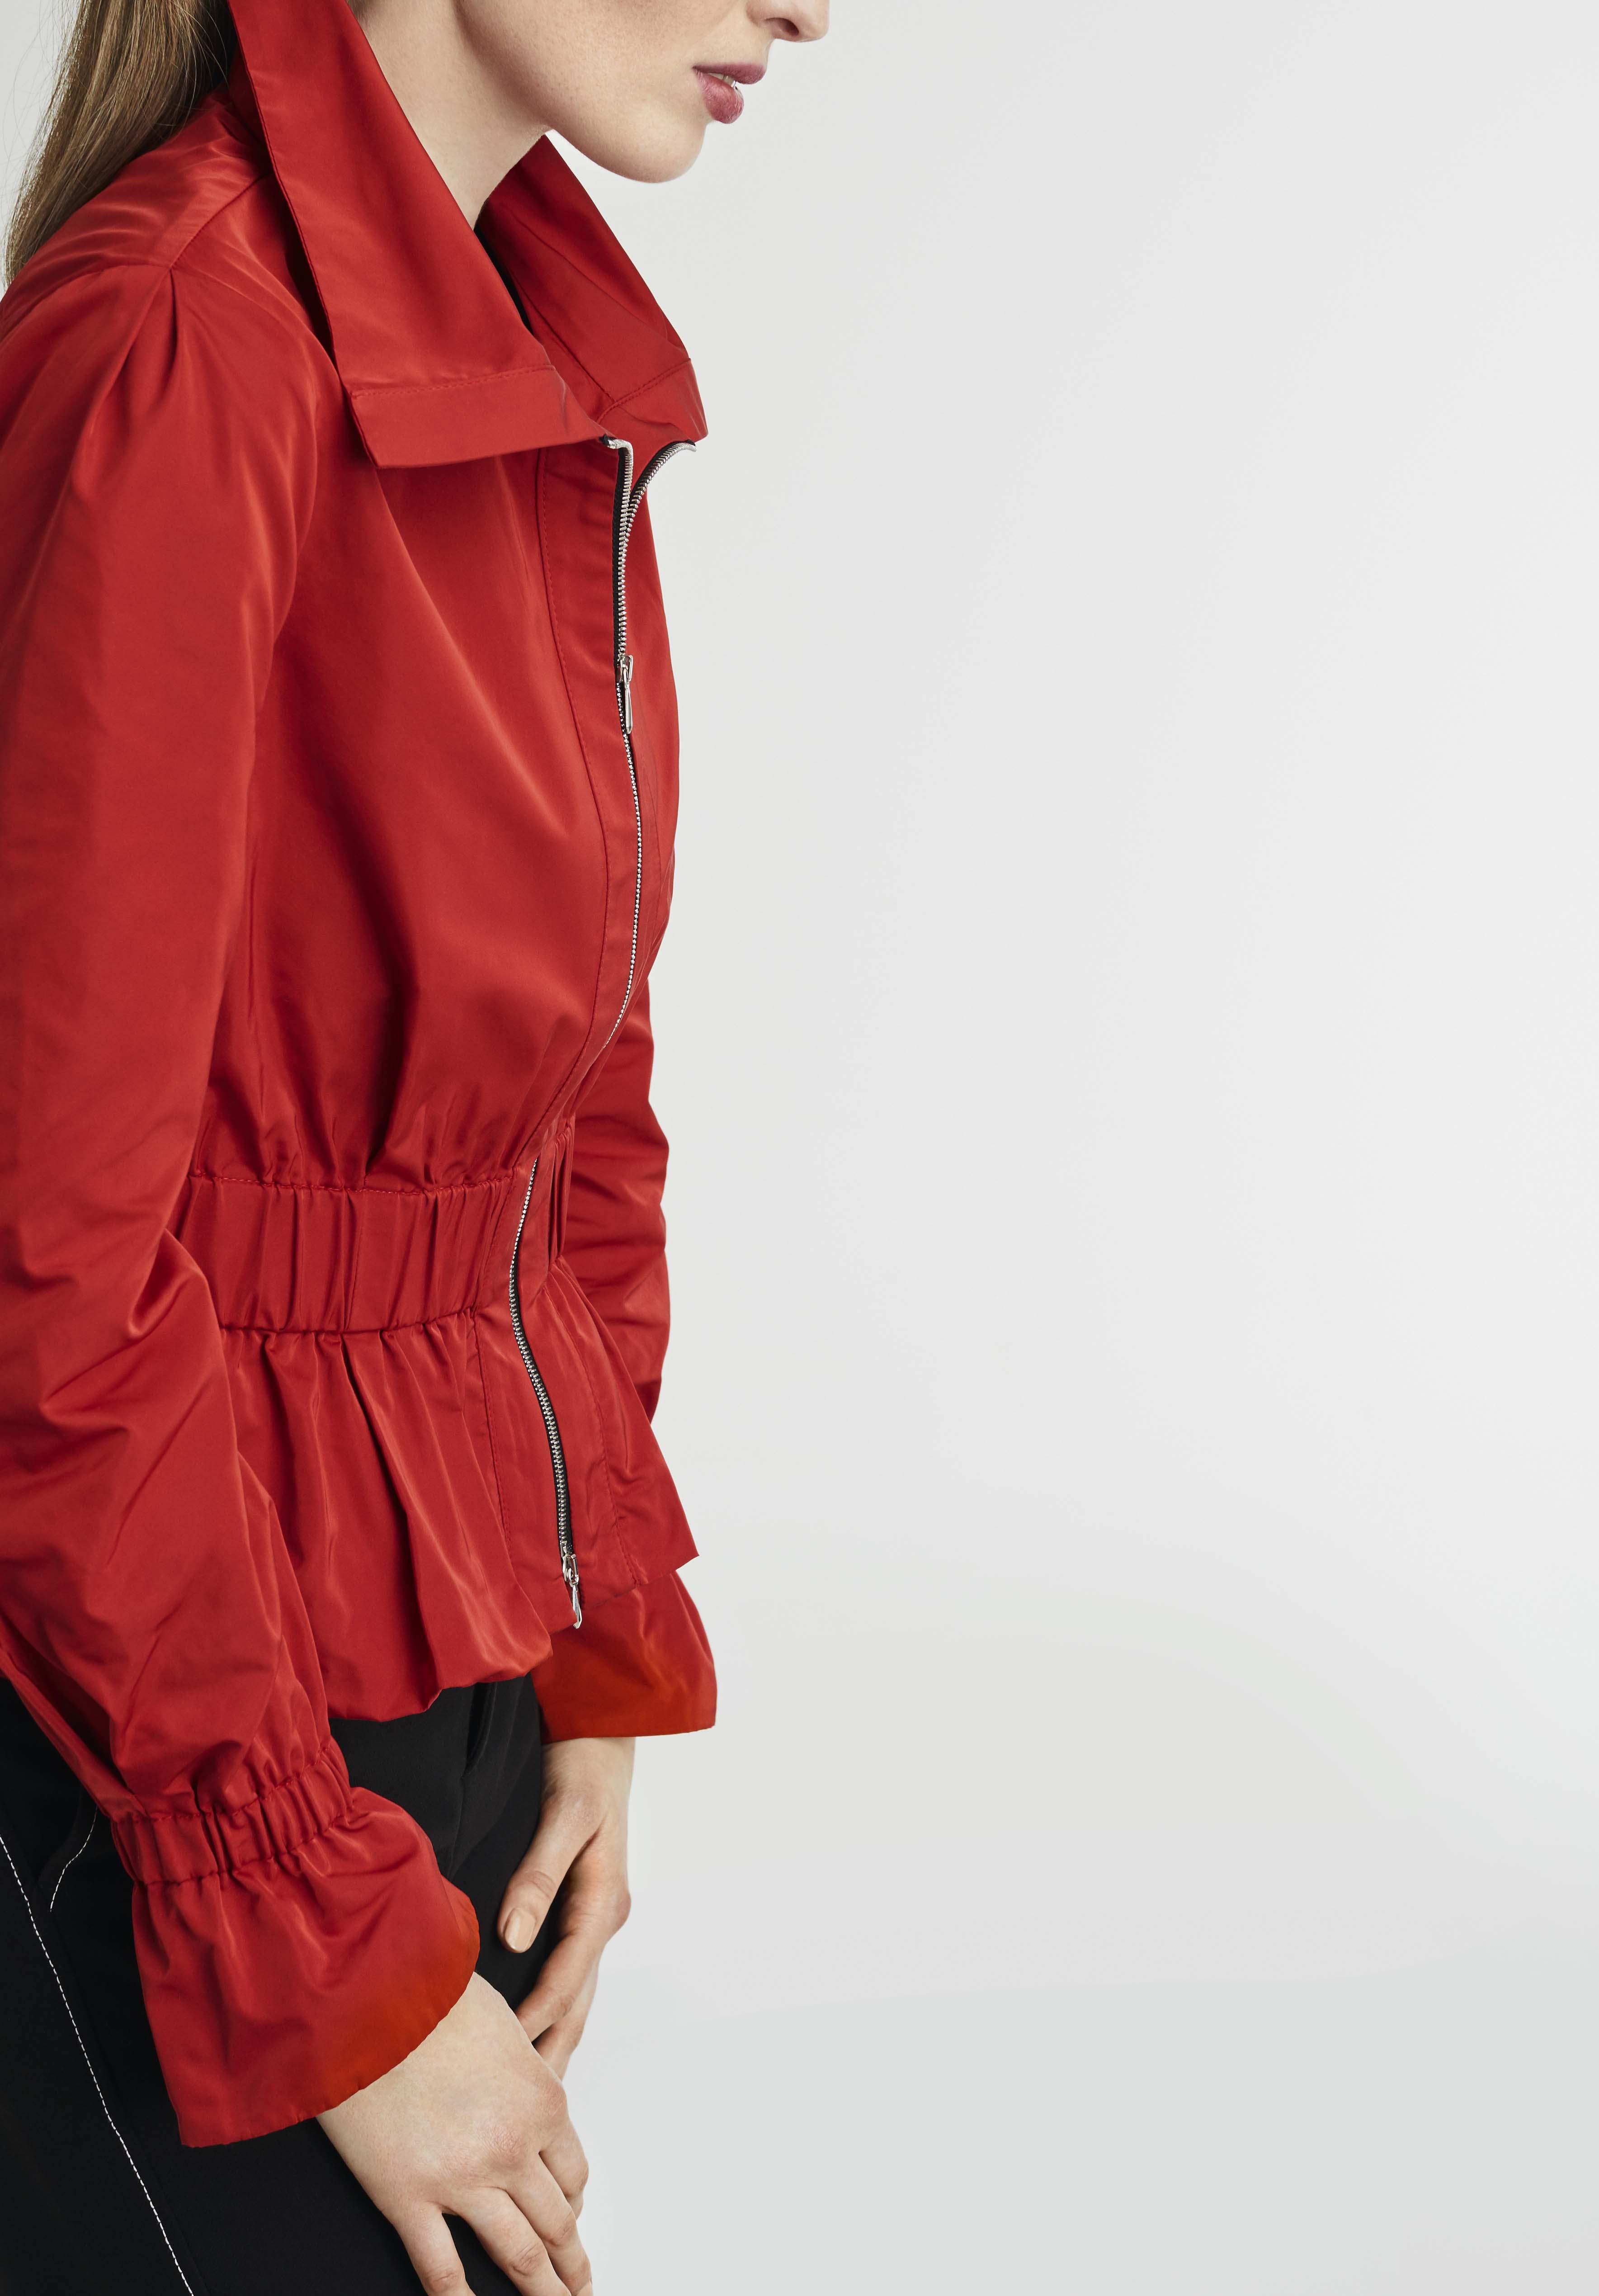 JoefferCaoc_FW19_Zip Front Jacket_Radzim